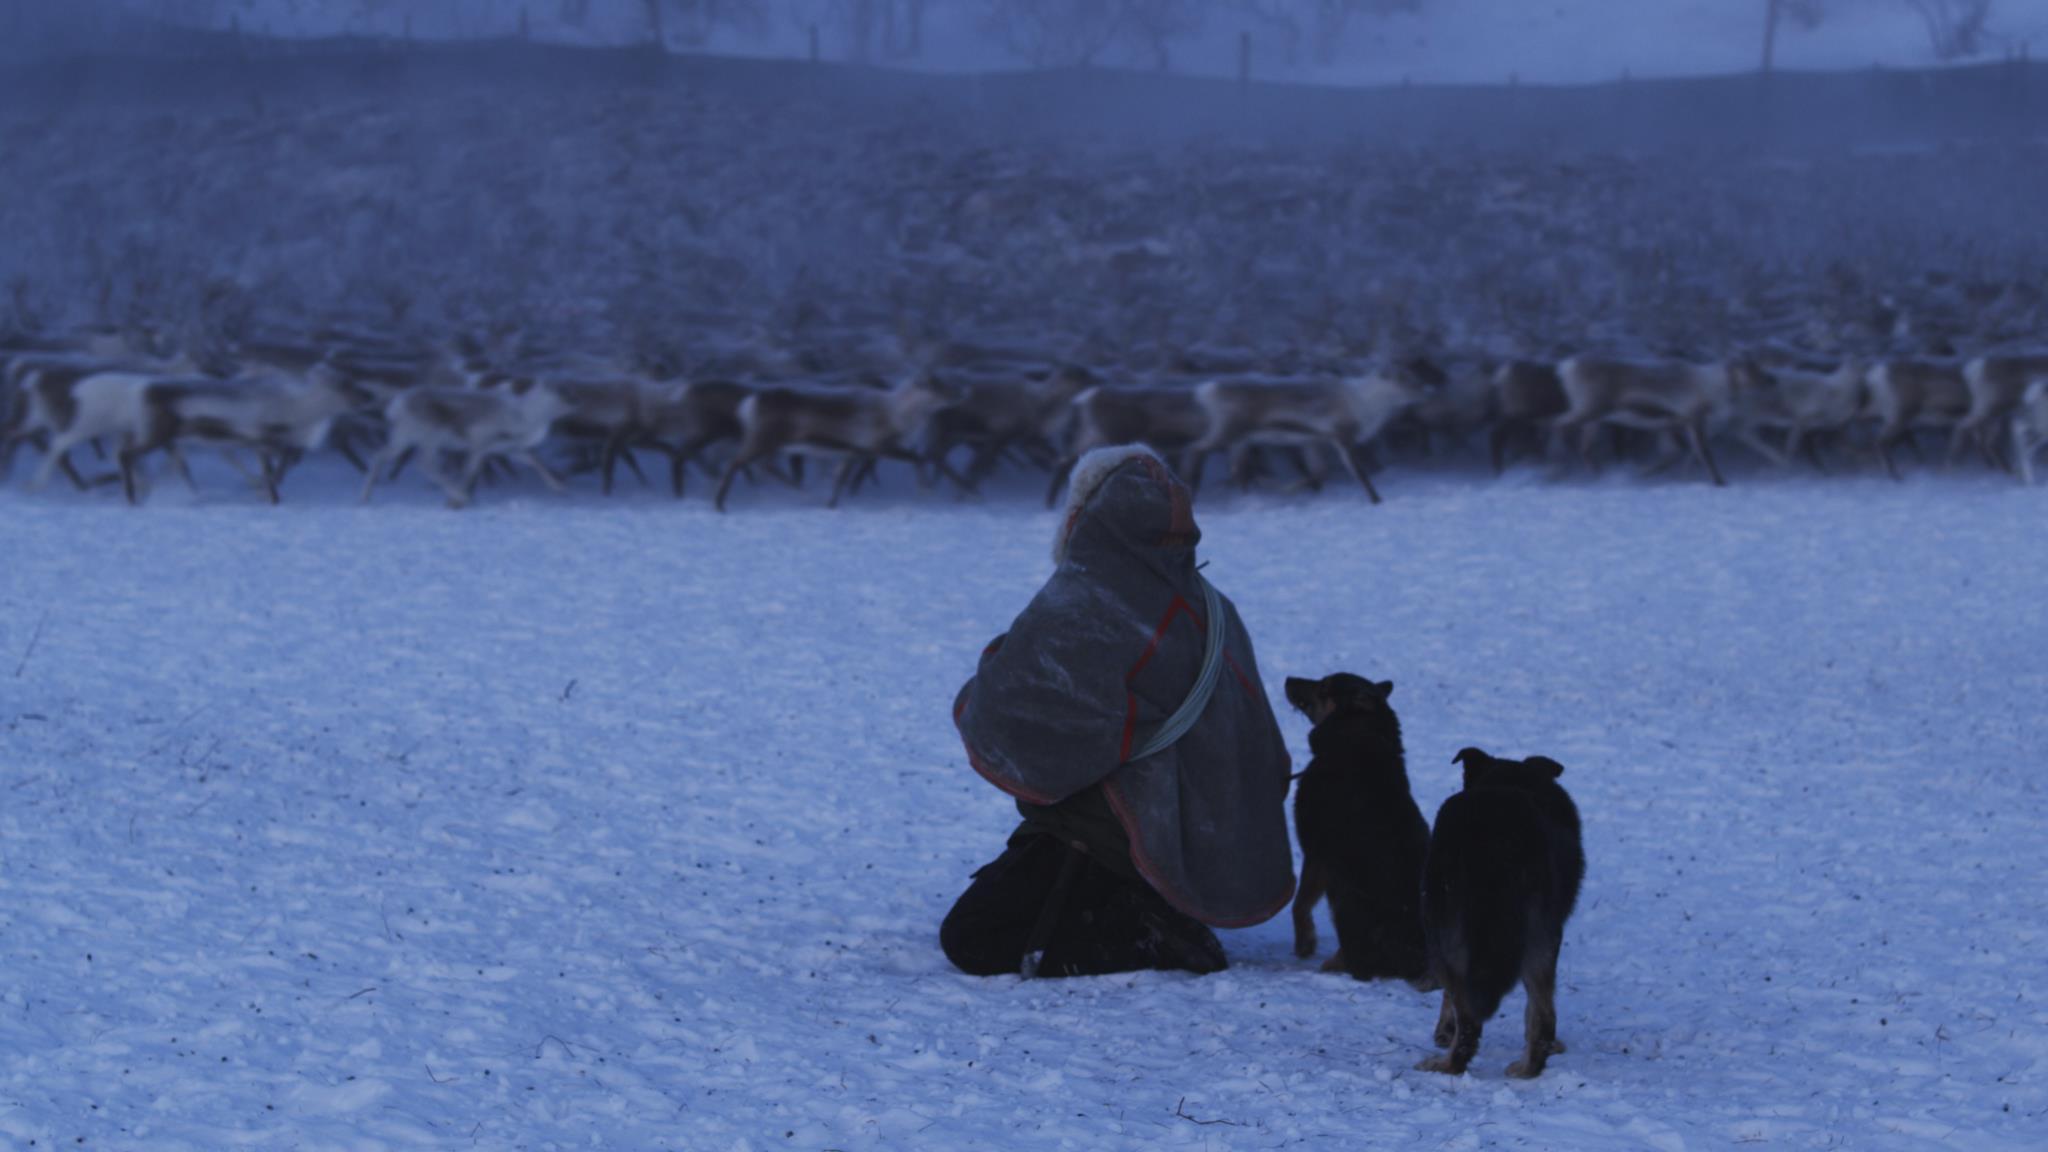 GUOĐOHIT - A unique encounter with a Sámi reindeer herding family.Director: Ken Are Bongo and Elle Márjá Eira Music: Morten H. Pettersen, Elle Márjá Eira Production: Kautokeino Film AS, Arctic Studios, Sahkkon Sound. Premiere was during the Tromsø International Film Festival 2013.